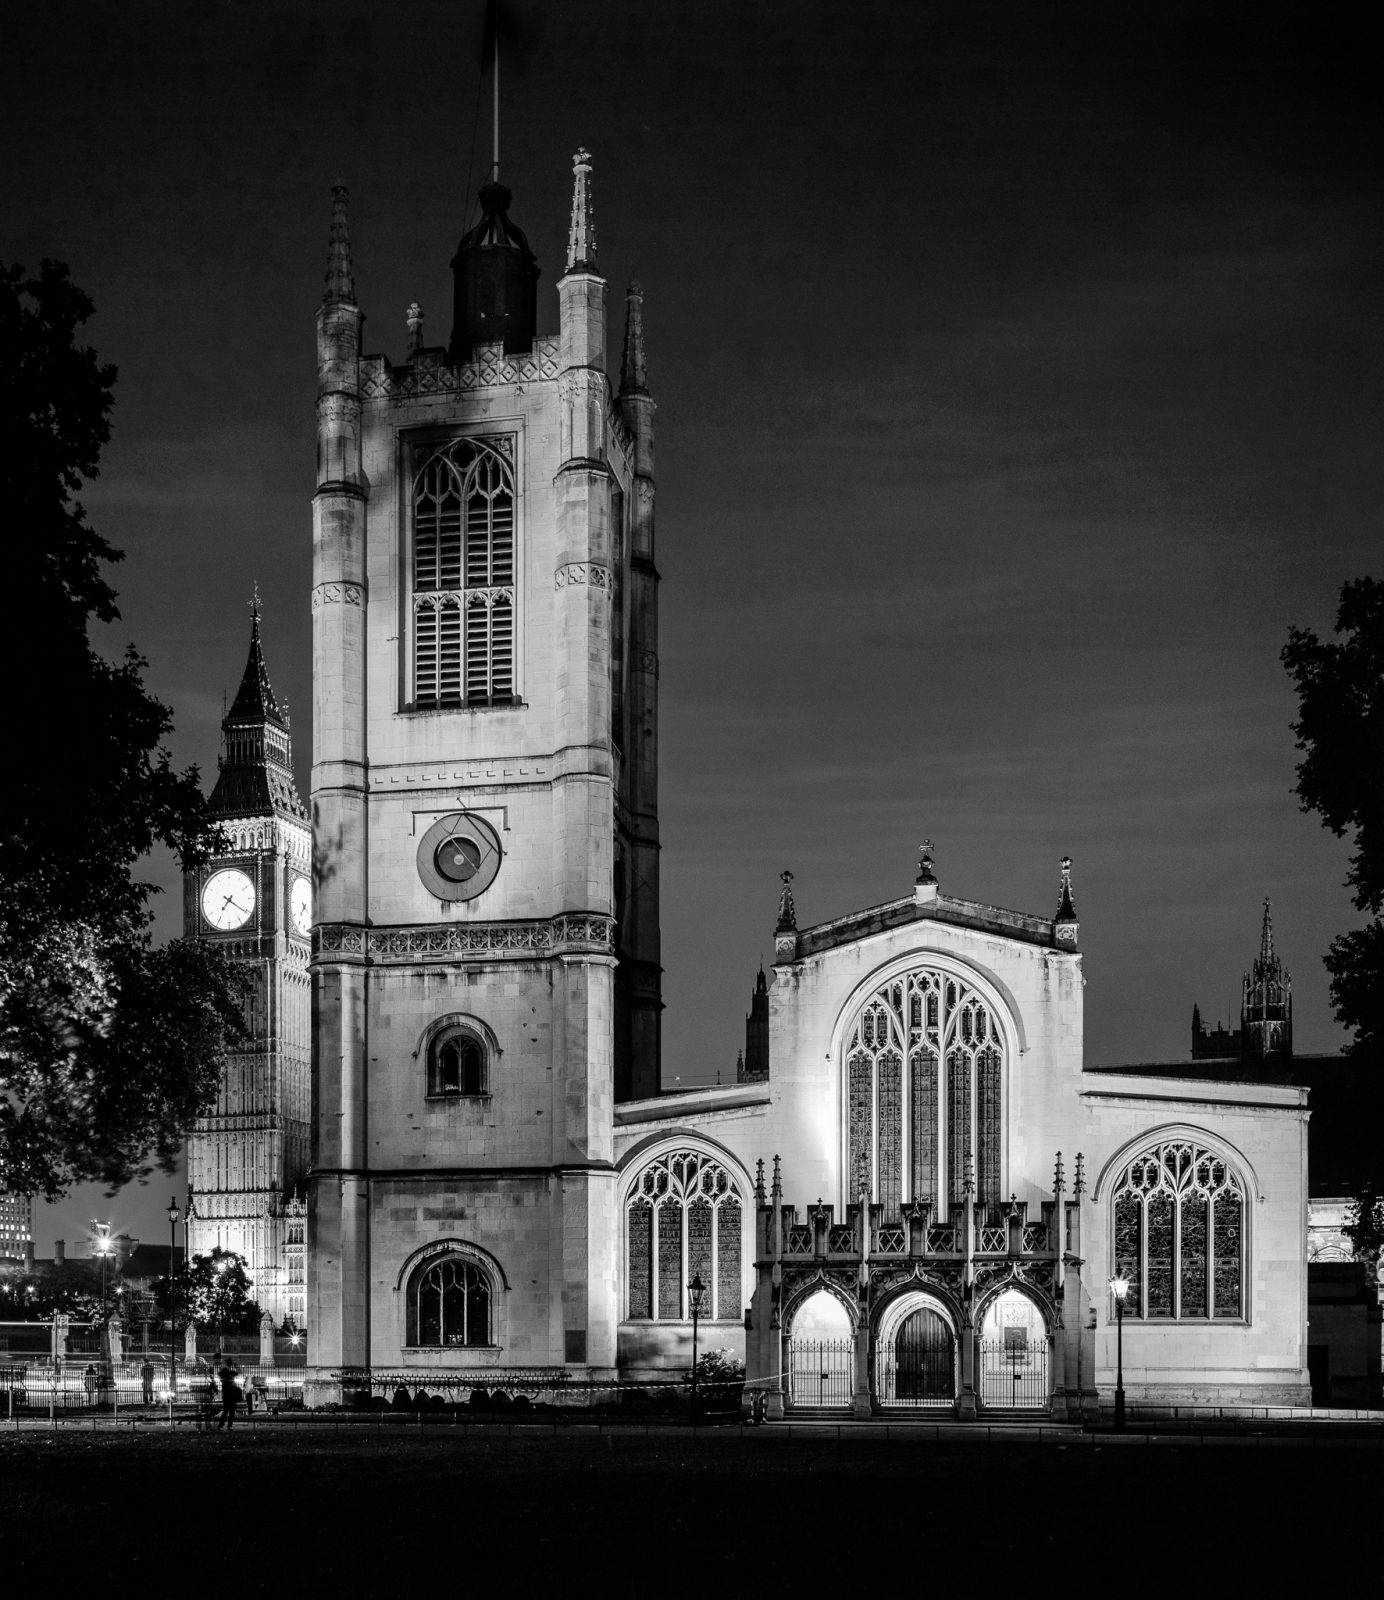 St Margaret's Church + Elizabeth Tower (aka Big Ben)